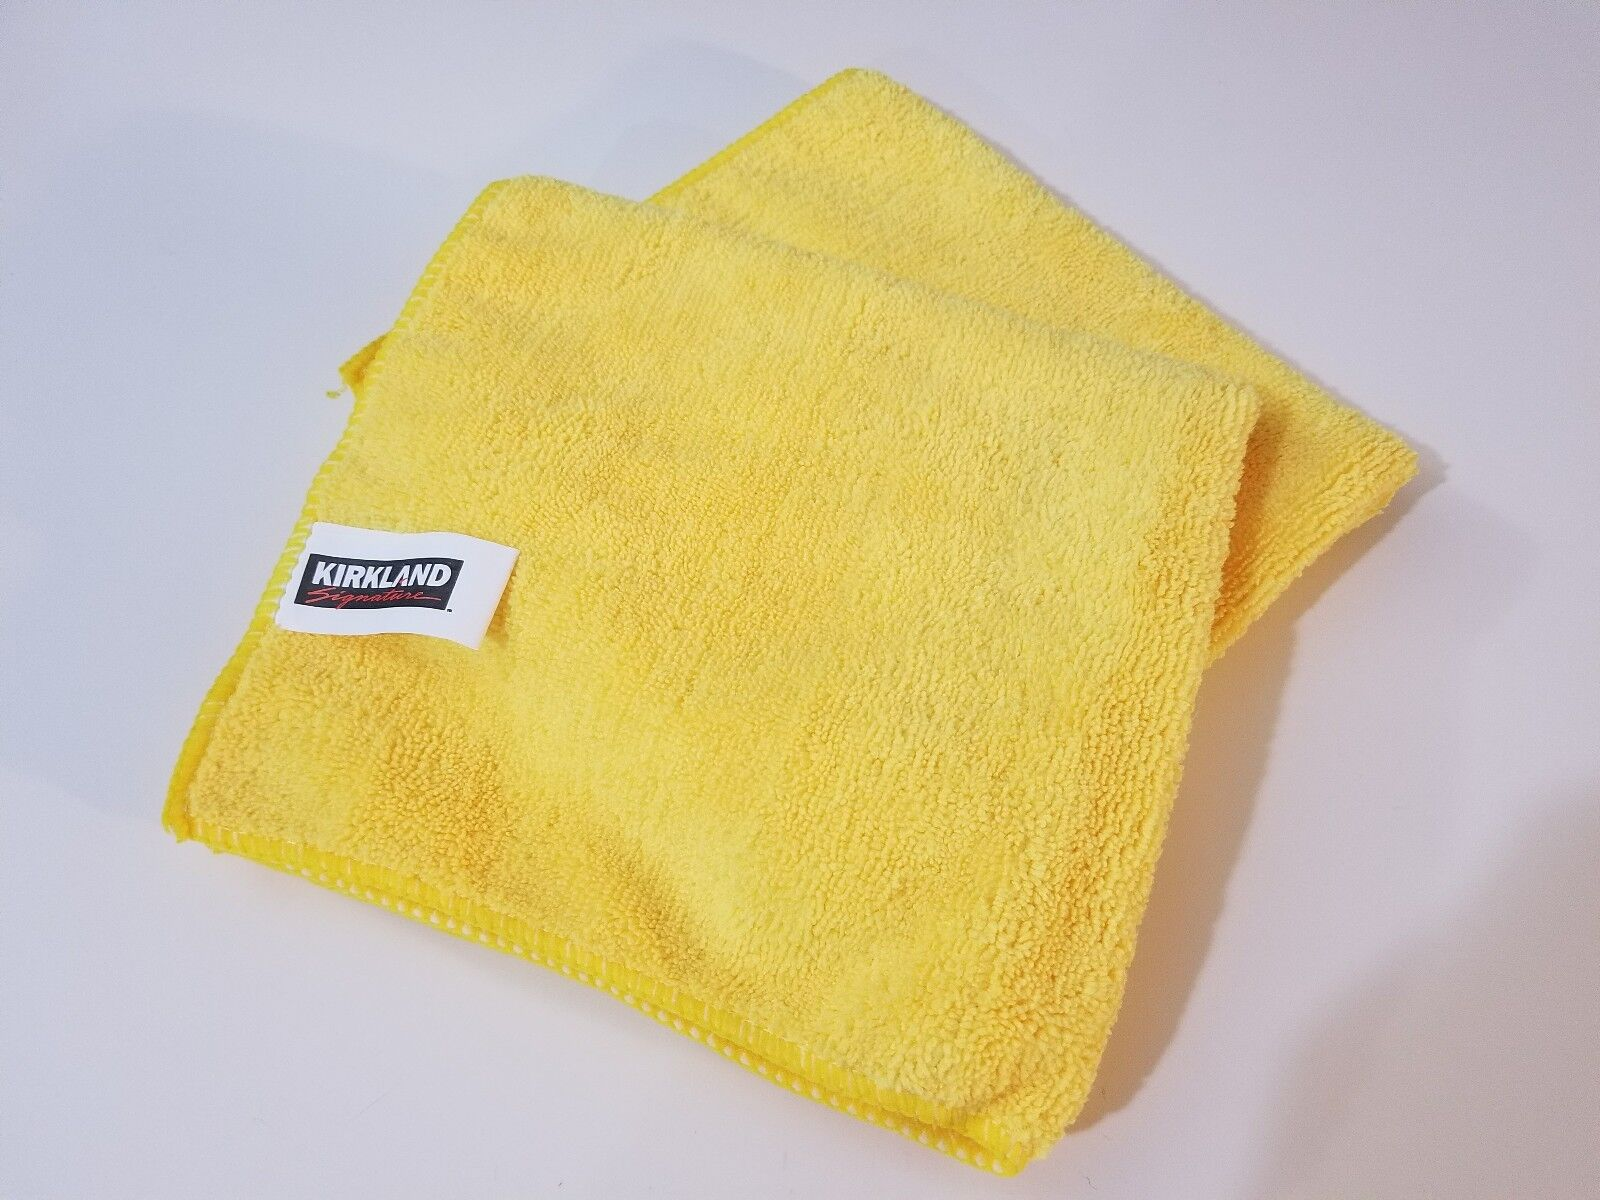 10 Pack Kirkland Signature Ultra Plush Microfiber Towels